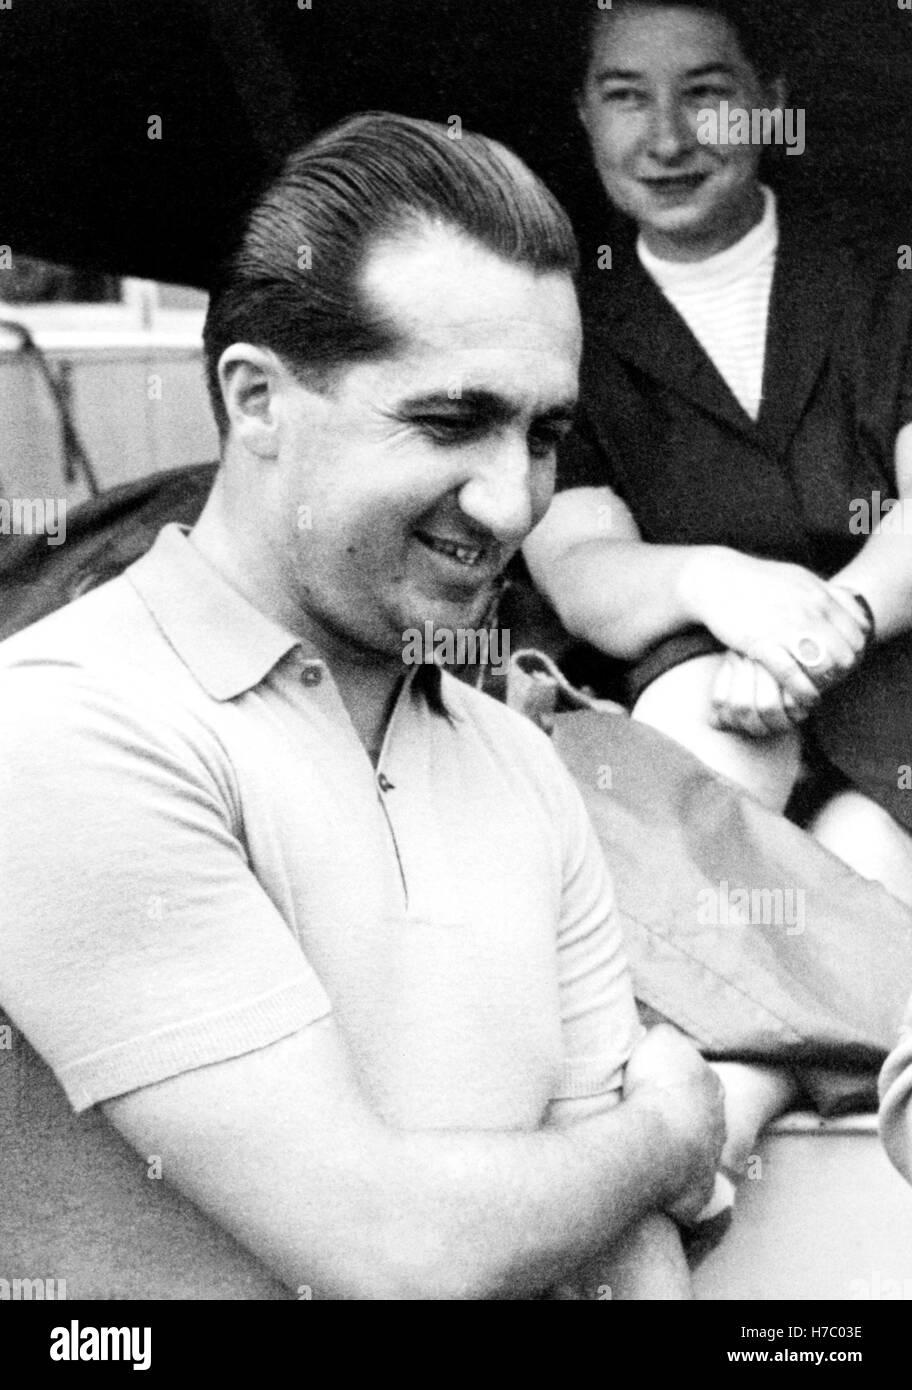 Alberto Ascari Stock Photo